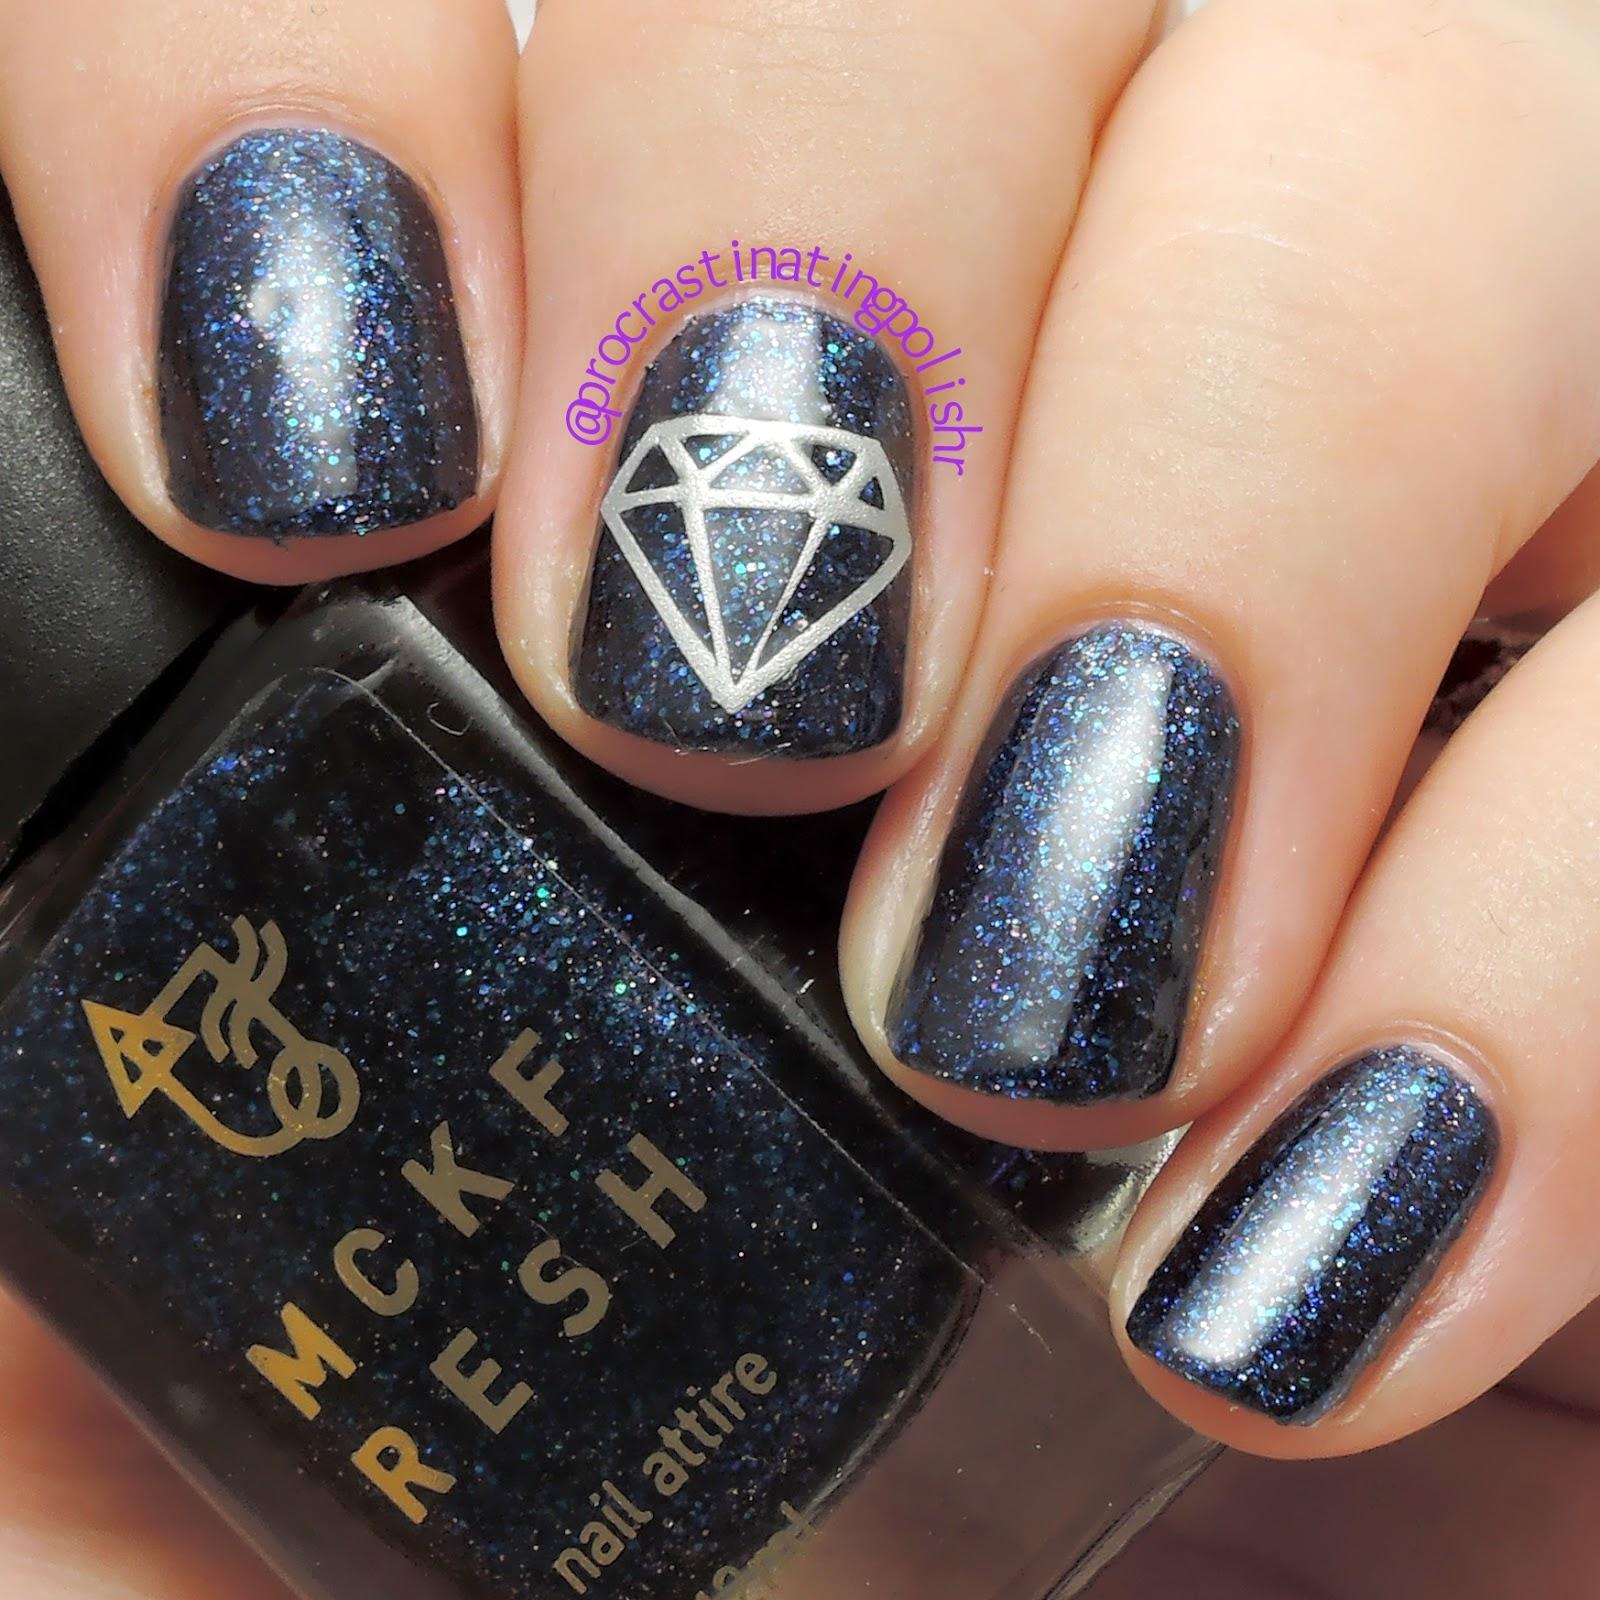 Mckfresh Diamond vinyl nail decals